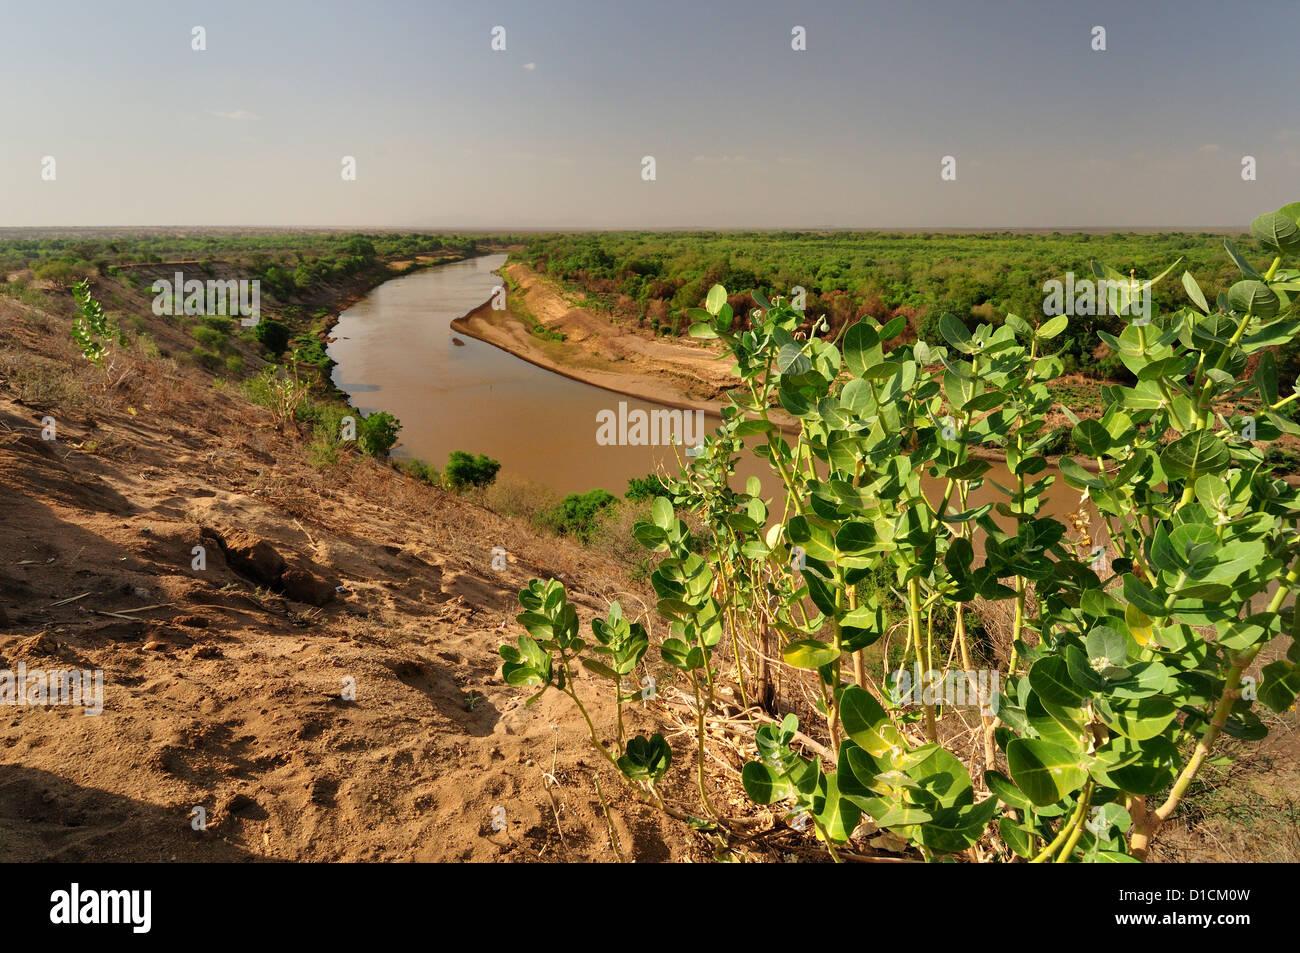 Omo River, Omo River Valley, Ethiopia, Africa - Stock Image